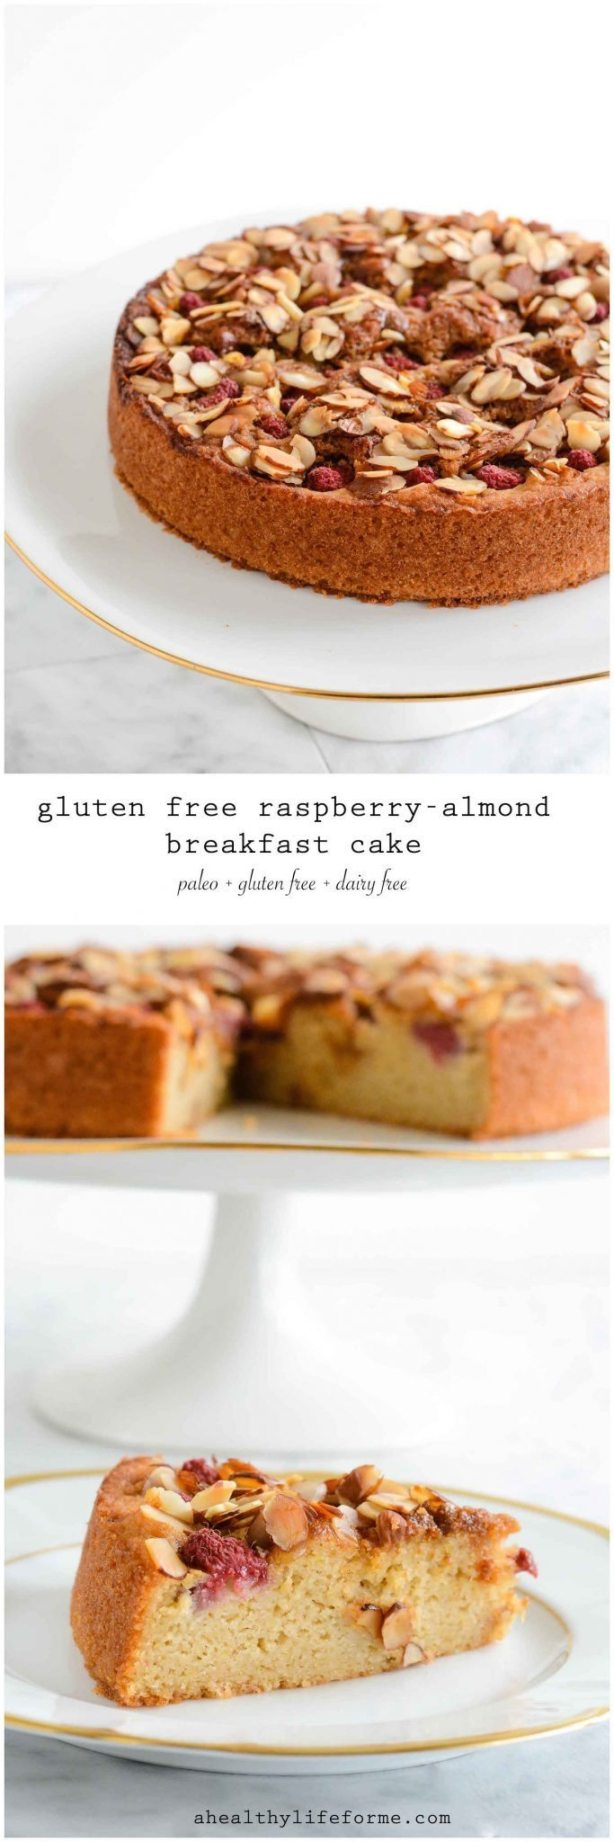 Gluten Free Raspberry Almond Cake is Paleo Dairy Free Delicious Recipe | ahealthylifeforme.com